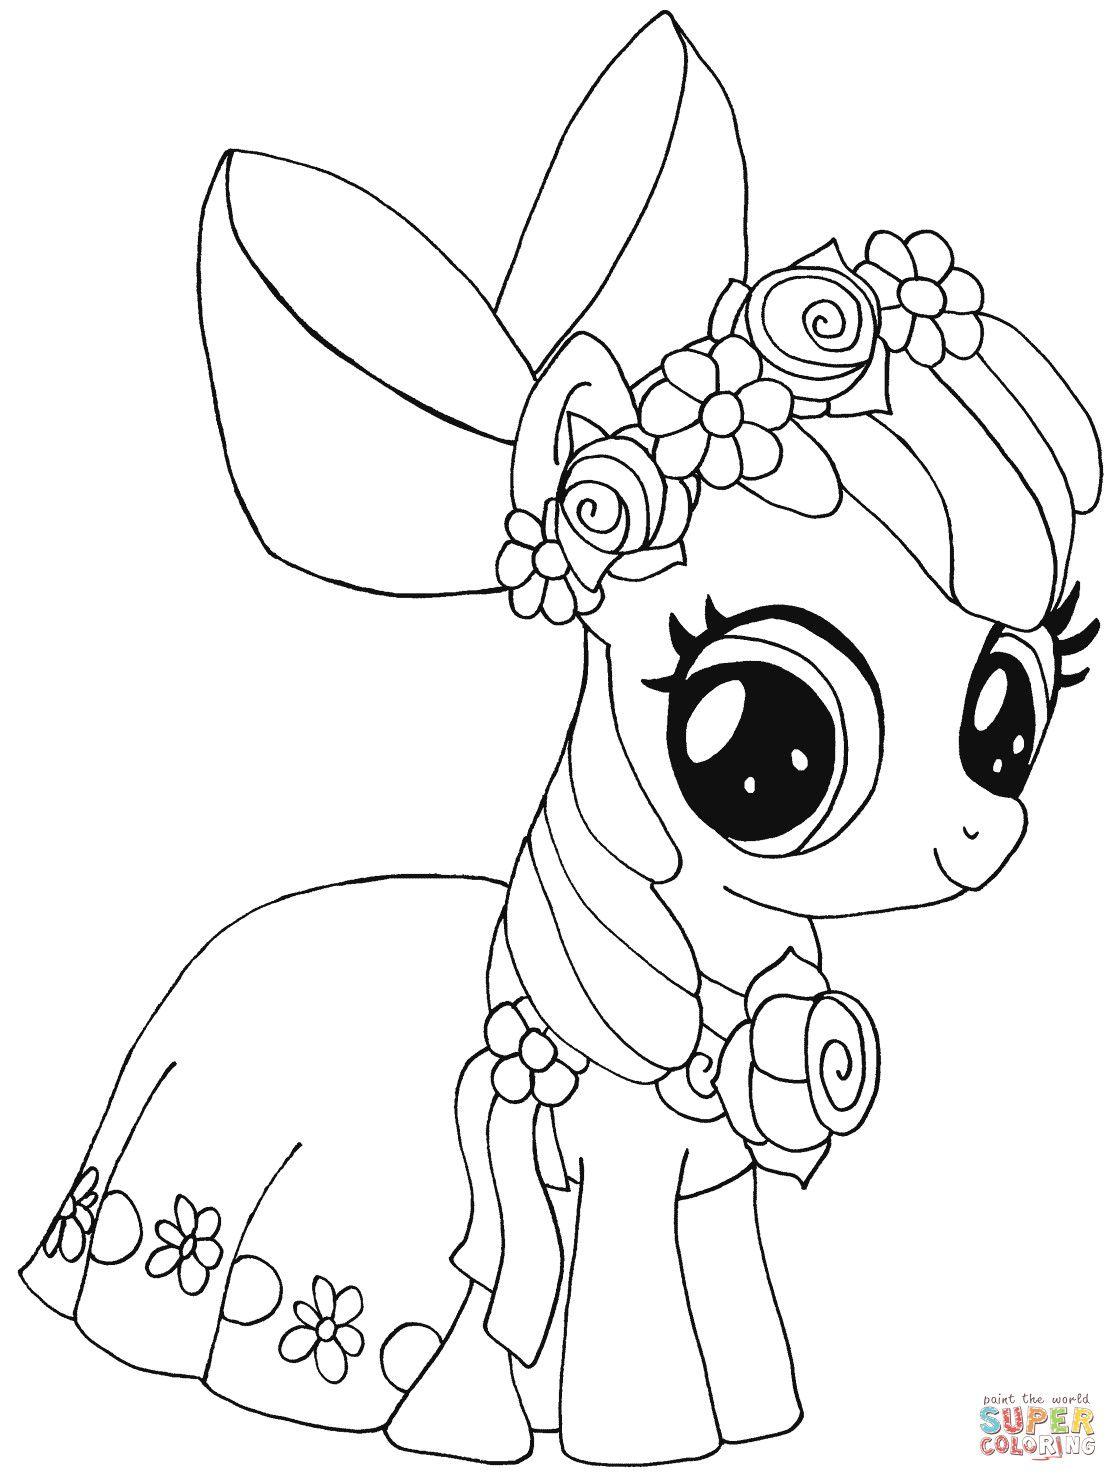 My Little Pony Coloring Sheets New My Little Pony Coloring Pages In 2020 My Little Pony Twilight Kostenlose Ausmalbilder Ausmalbilder